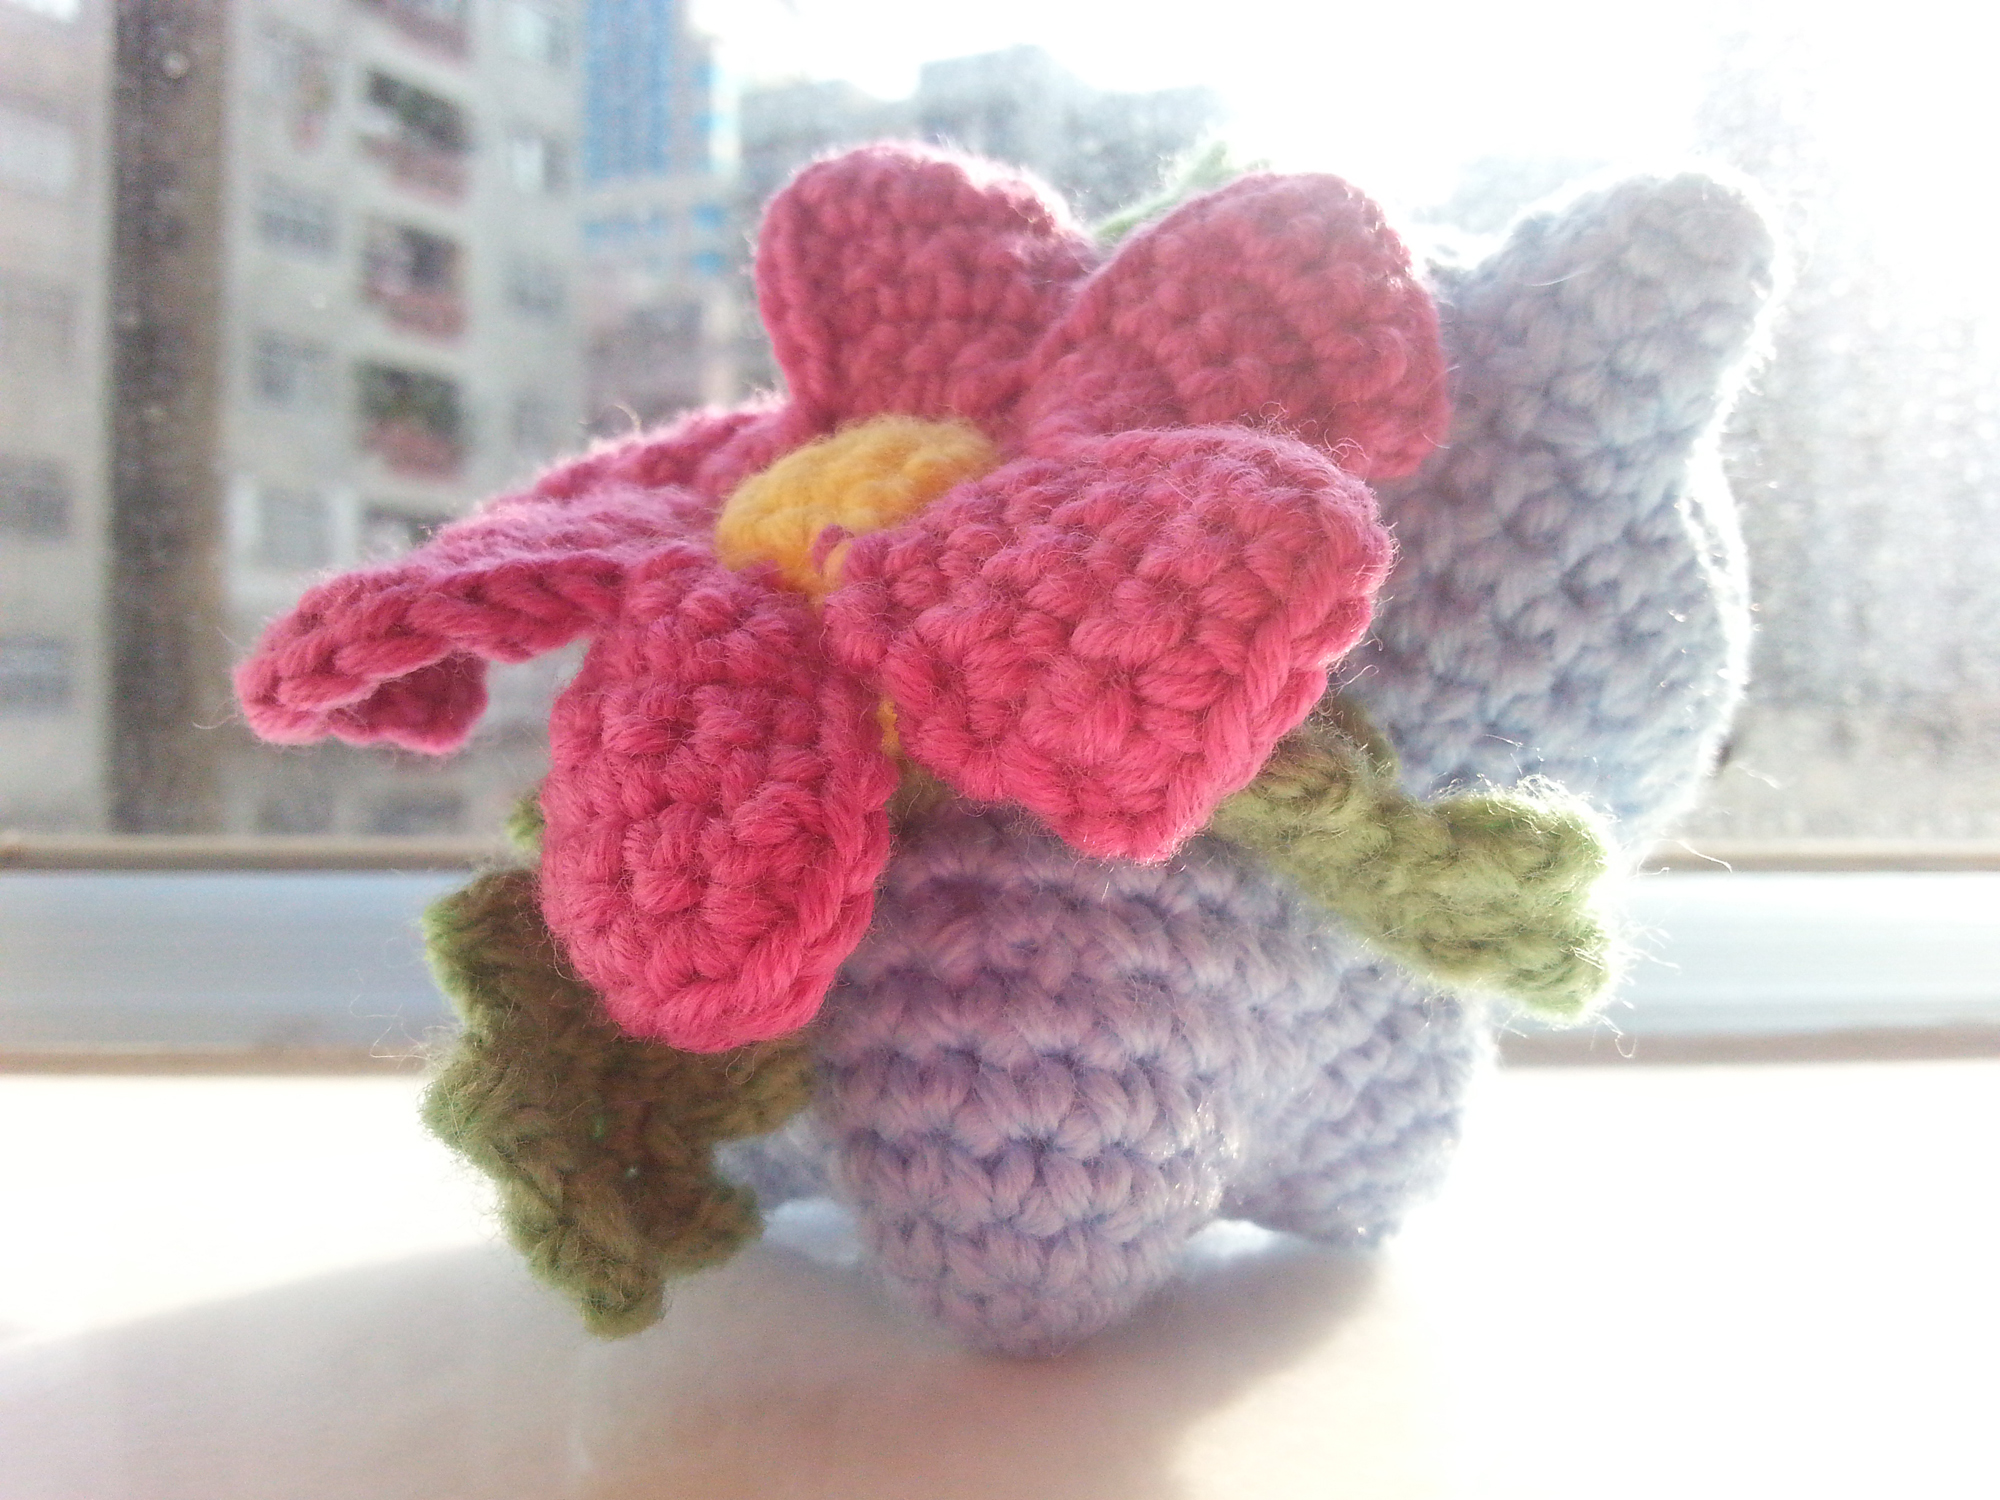 Bulbasaur Evolution Set Amigurumi Crochet Plush Ivysaur Venusaur